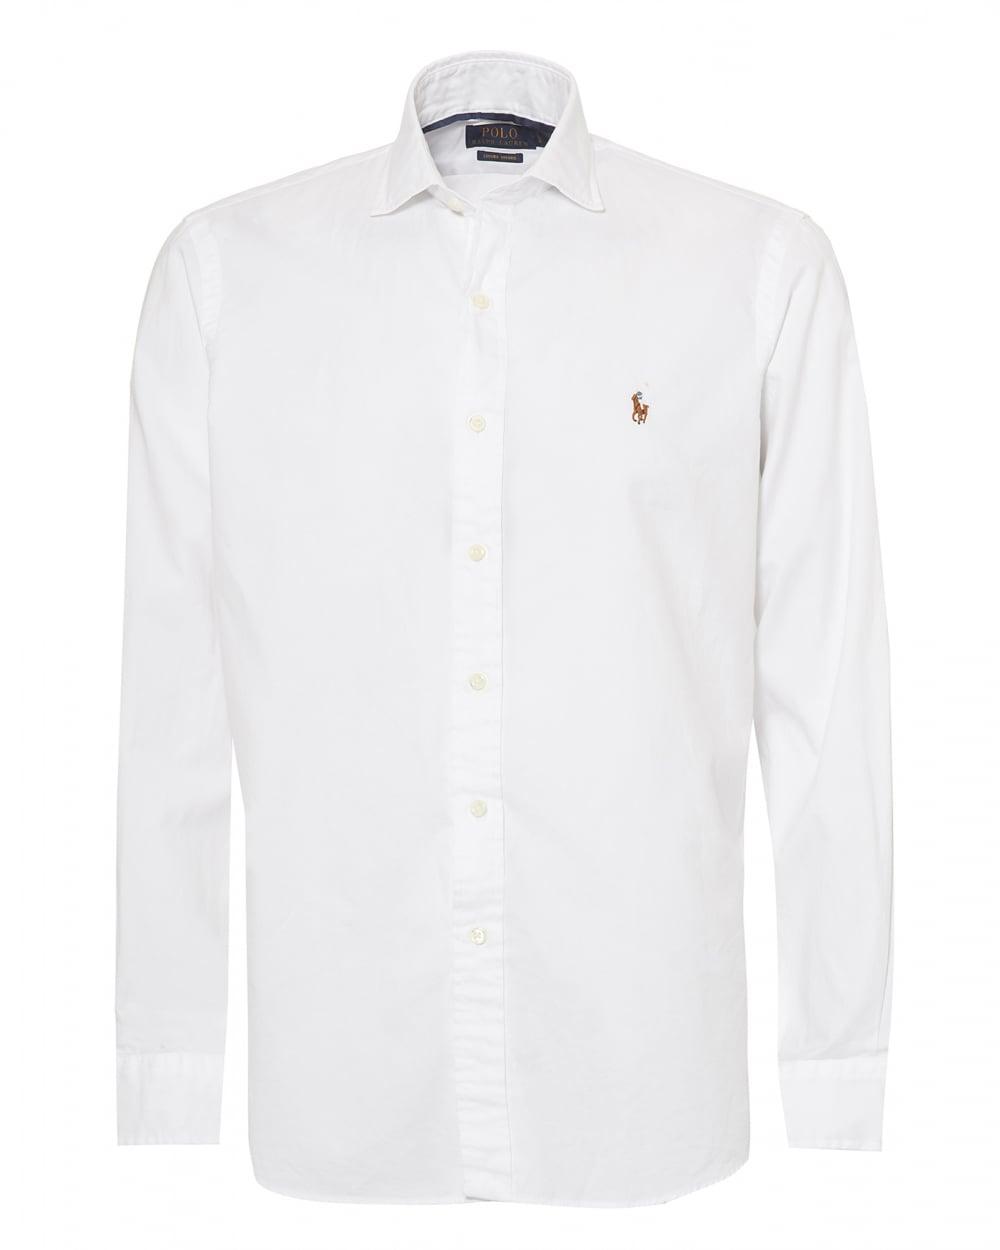 Ralph Lauren Mens Luxury Oxford Slim Fit White Shirt